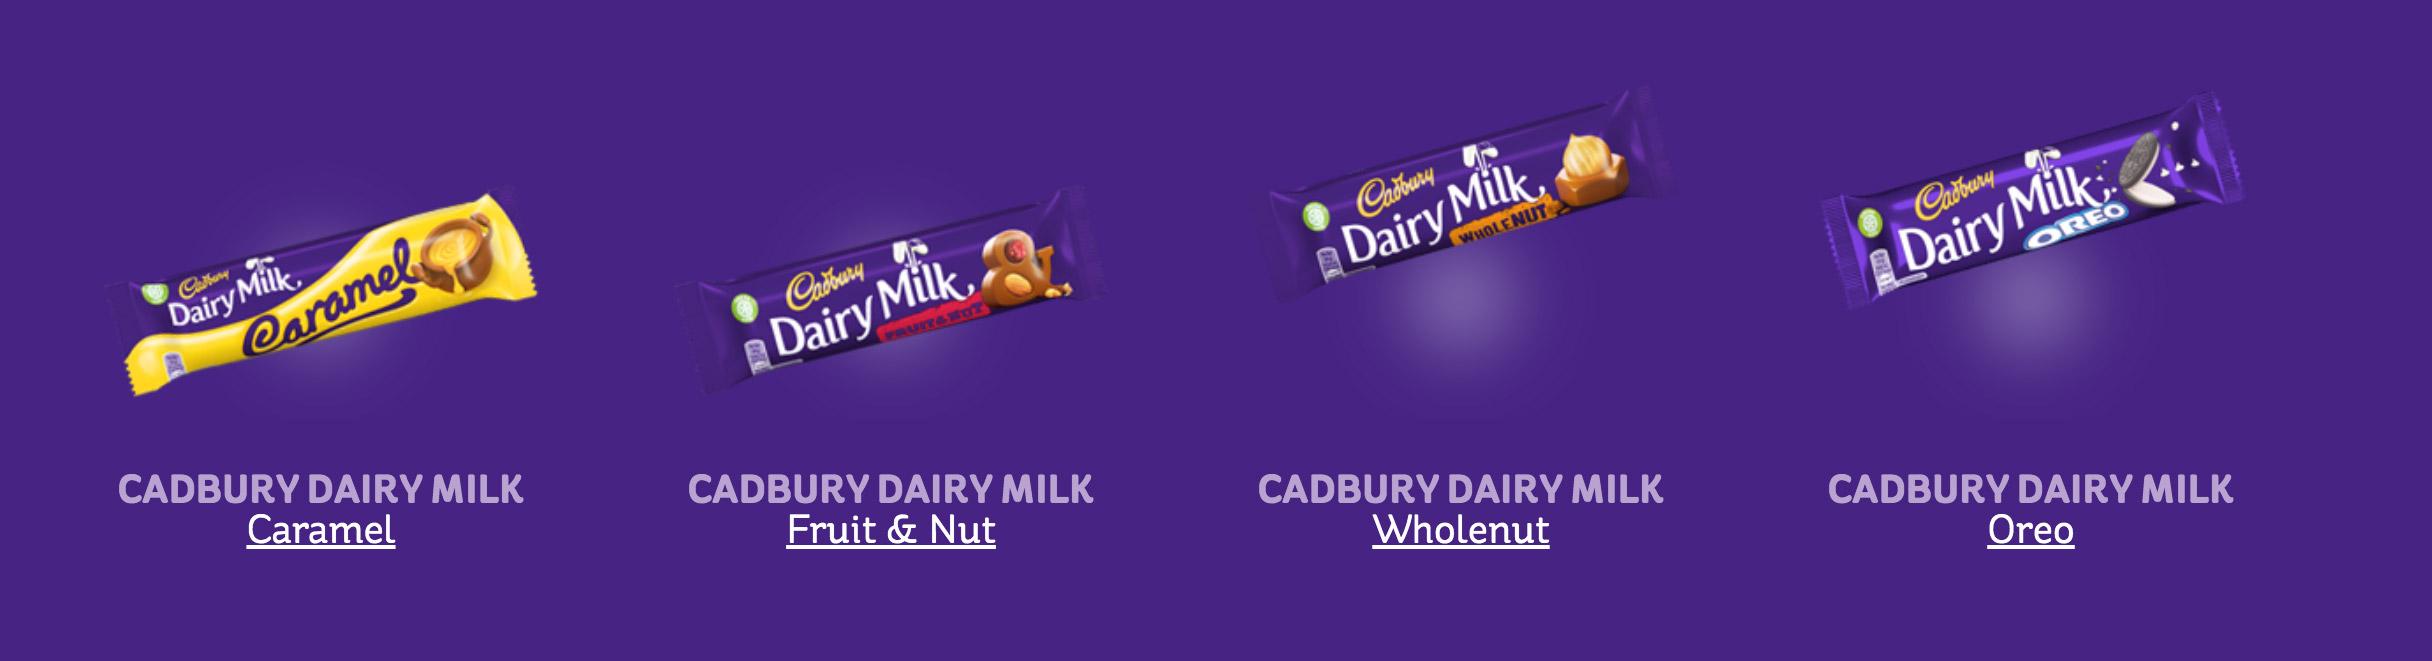 cadbury dairy milk flavors